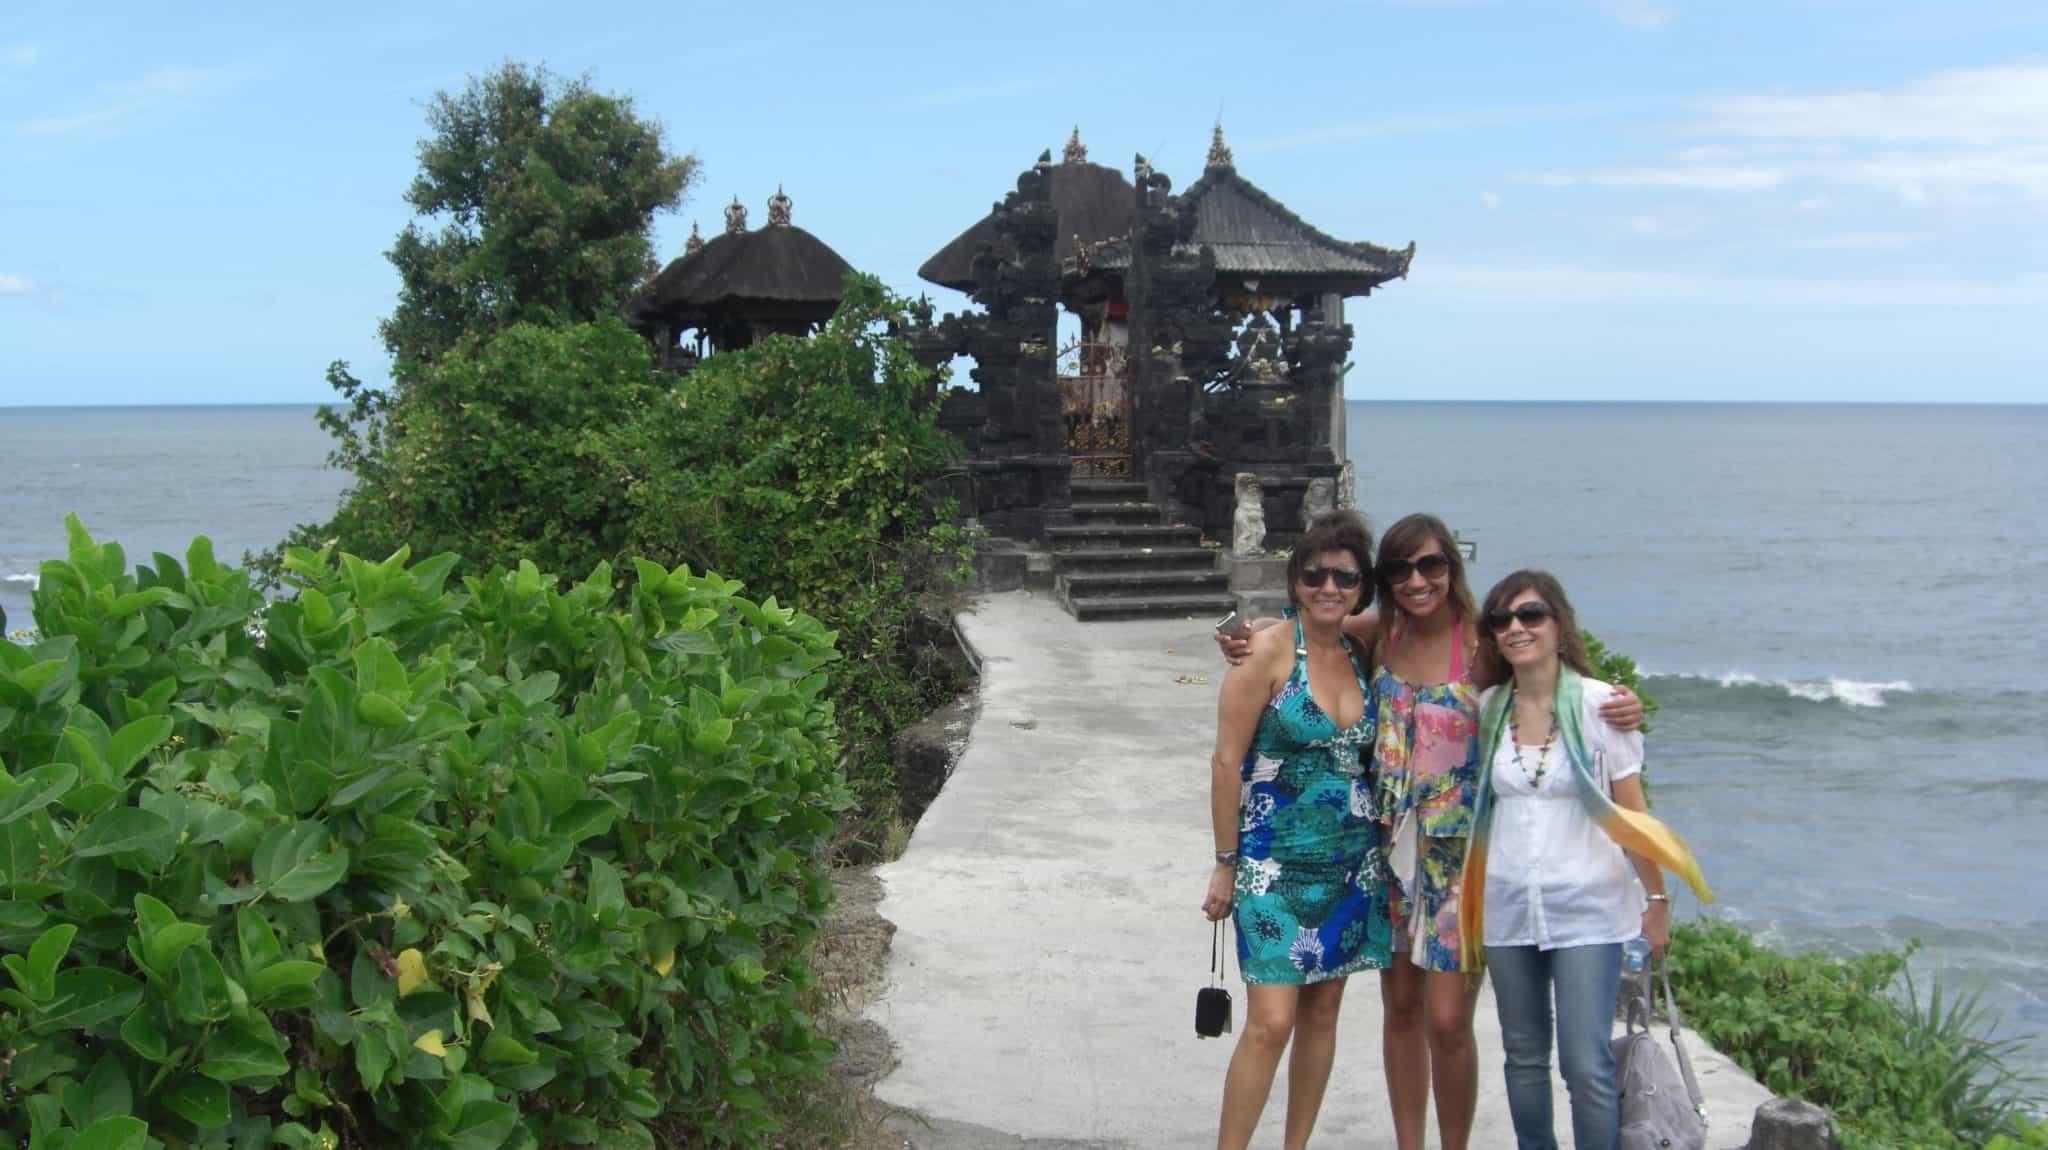 No Templo Pura Tanah Lot, em Bali